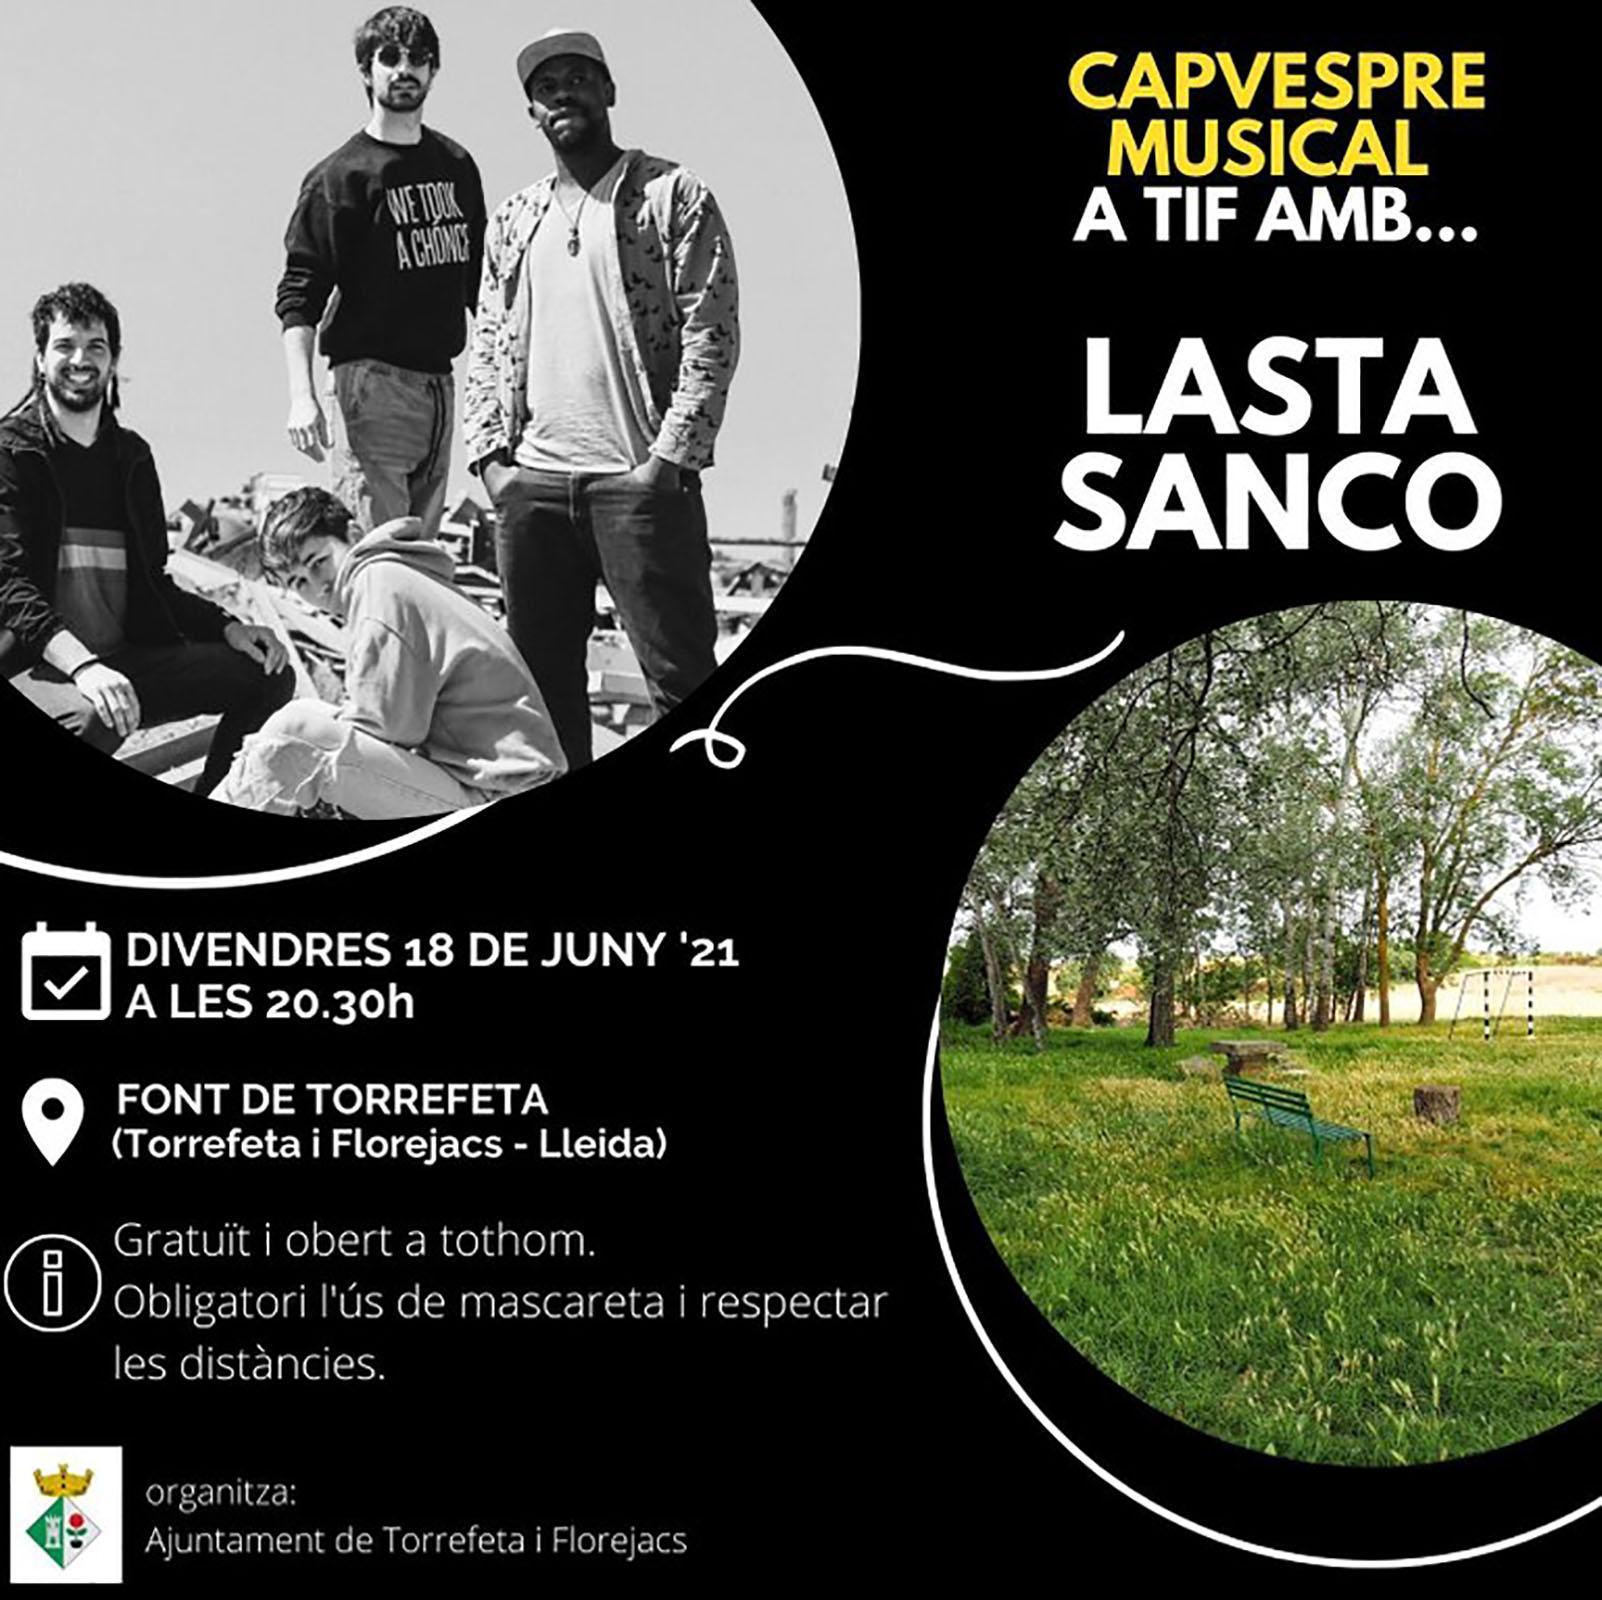 cartell Capvespre musical amb Lasta Sanco